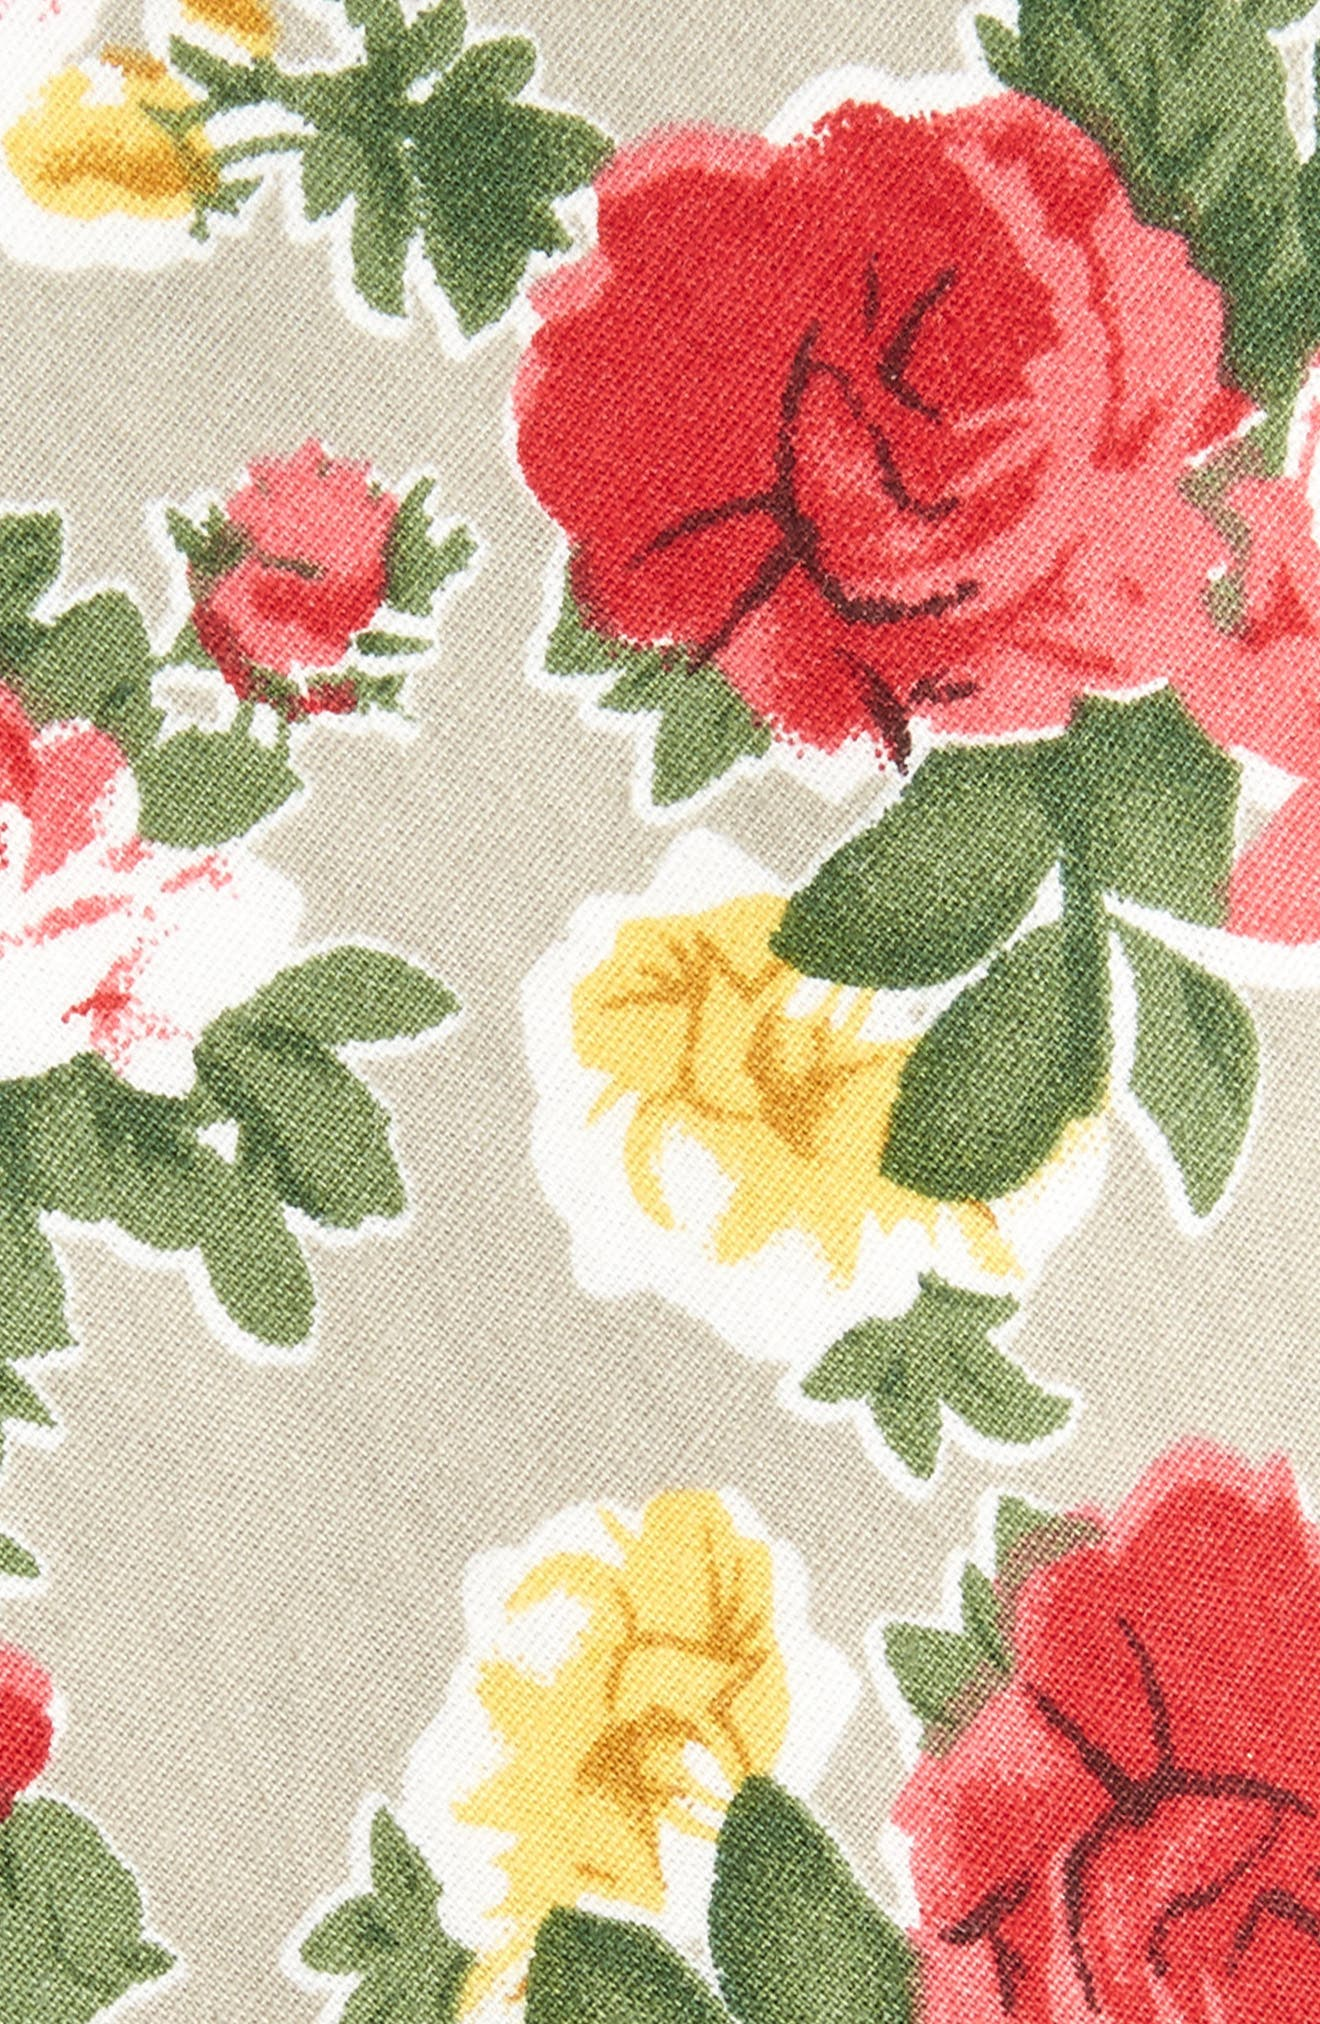 Iverson Floral Cotton Skinny Tie,                             Alternate thumbnail 2, color,                             329